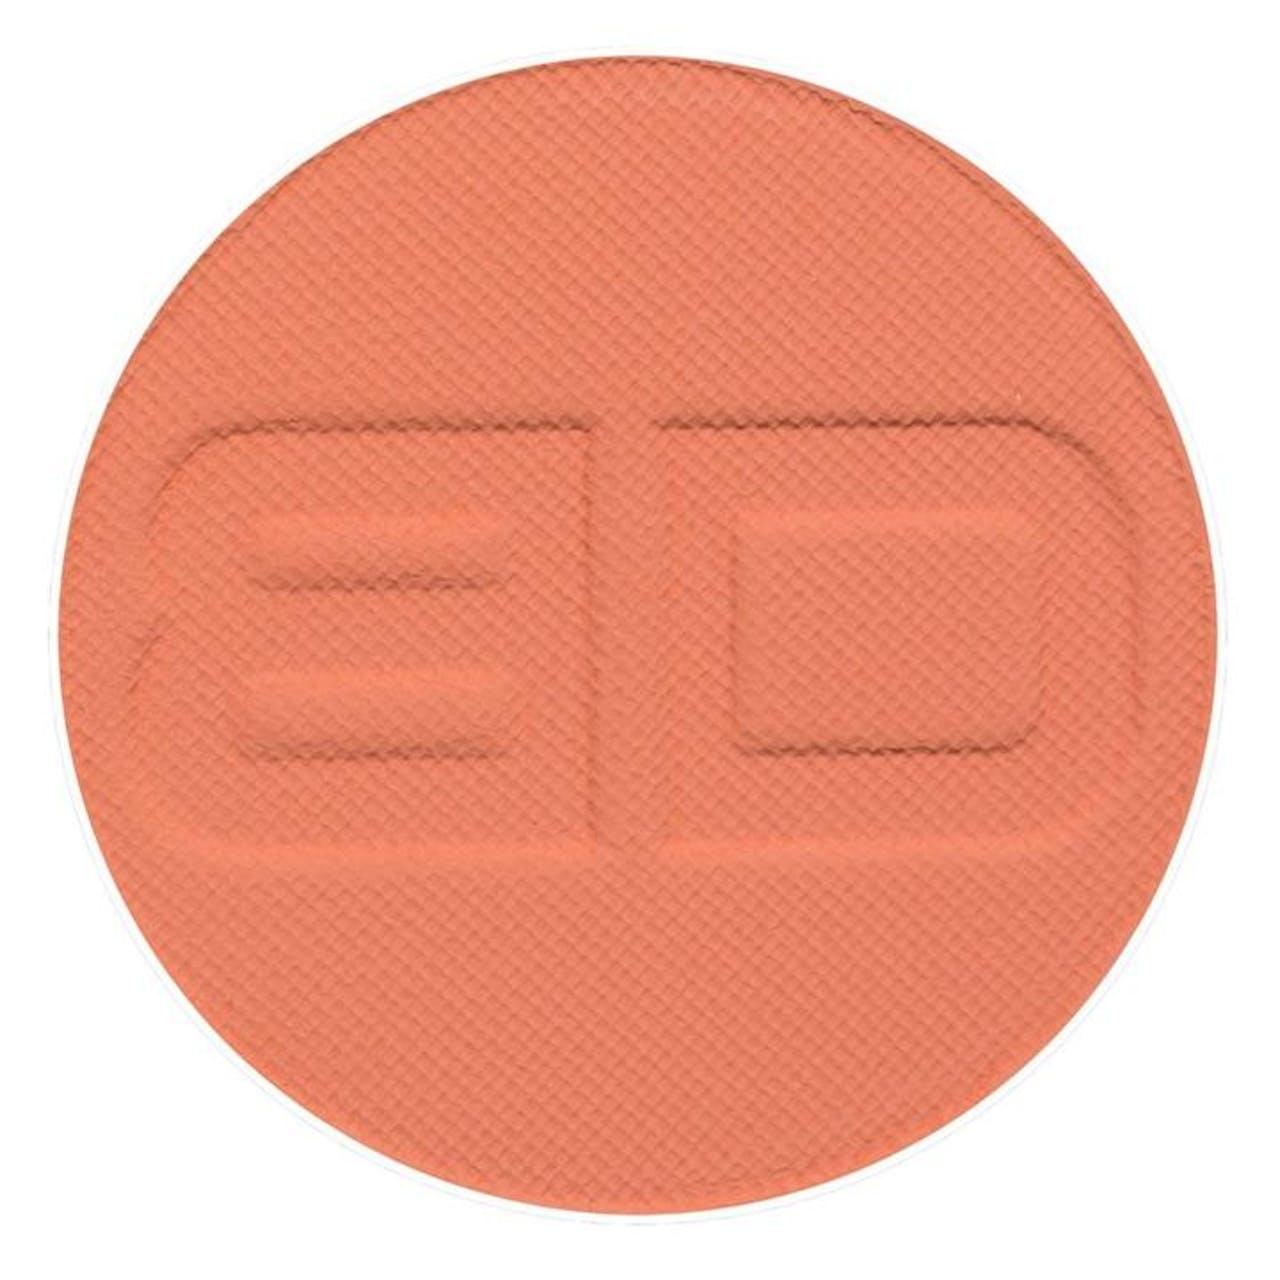 BD Puderpigment Mandarine Refill 2,5g - 5.40€/1g